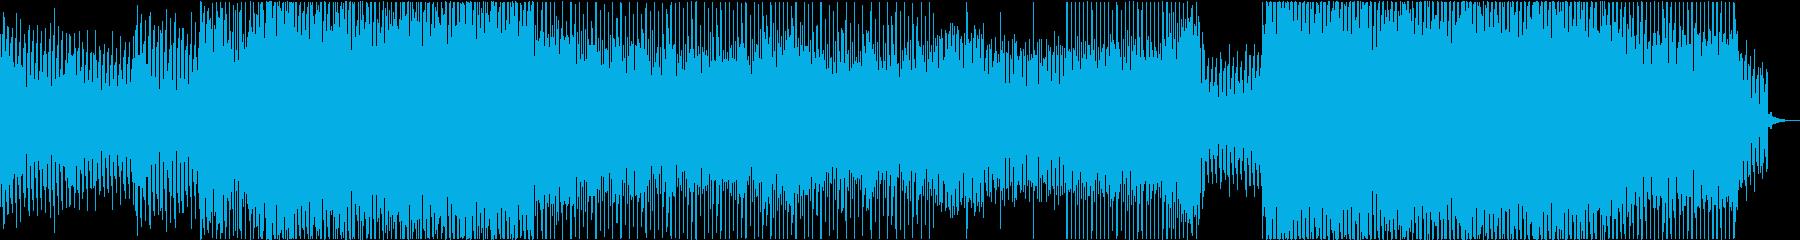 EDM 楽しい 明るい バラエティーTVの再生済みの波形